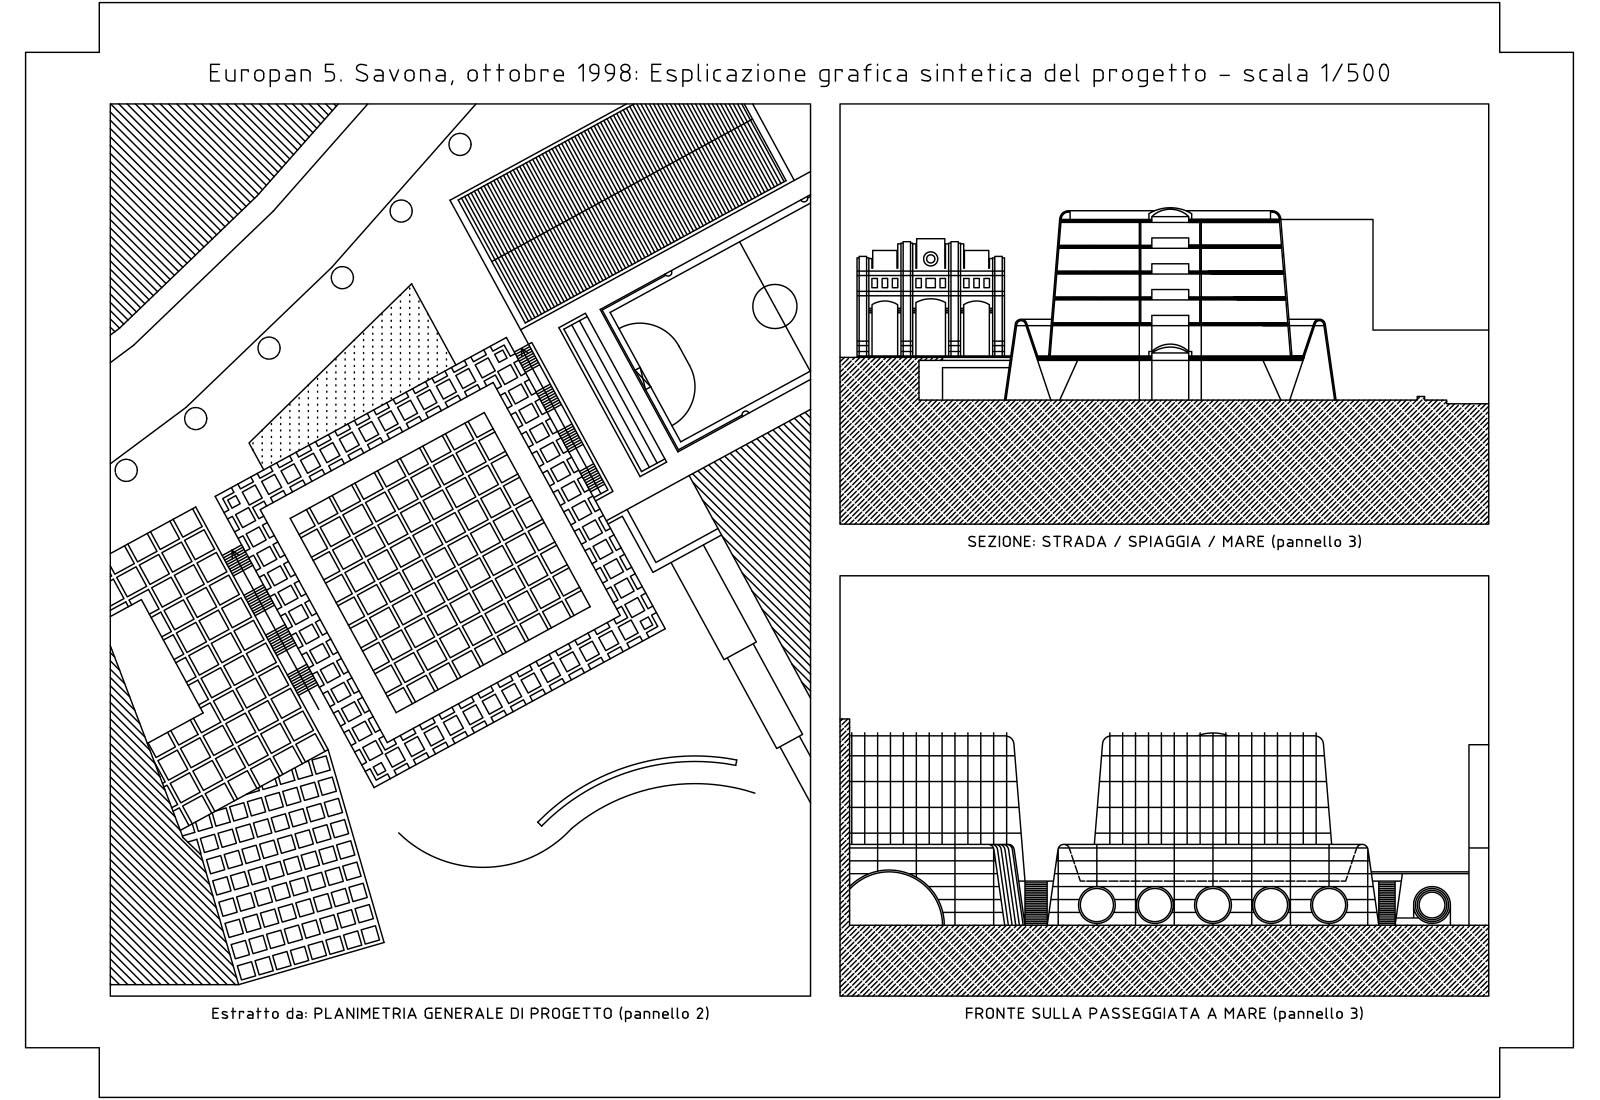 Paesaggi residenziali Savona - Sintesi del progetto